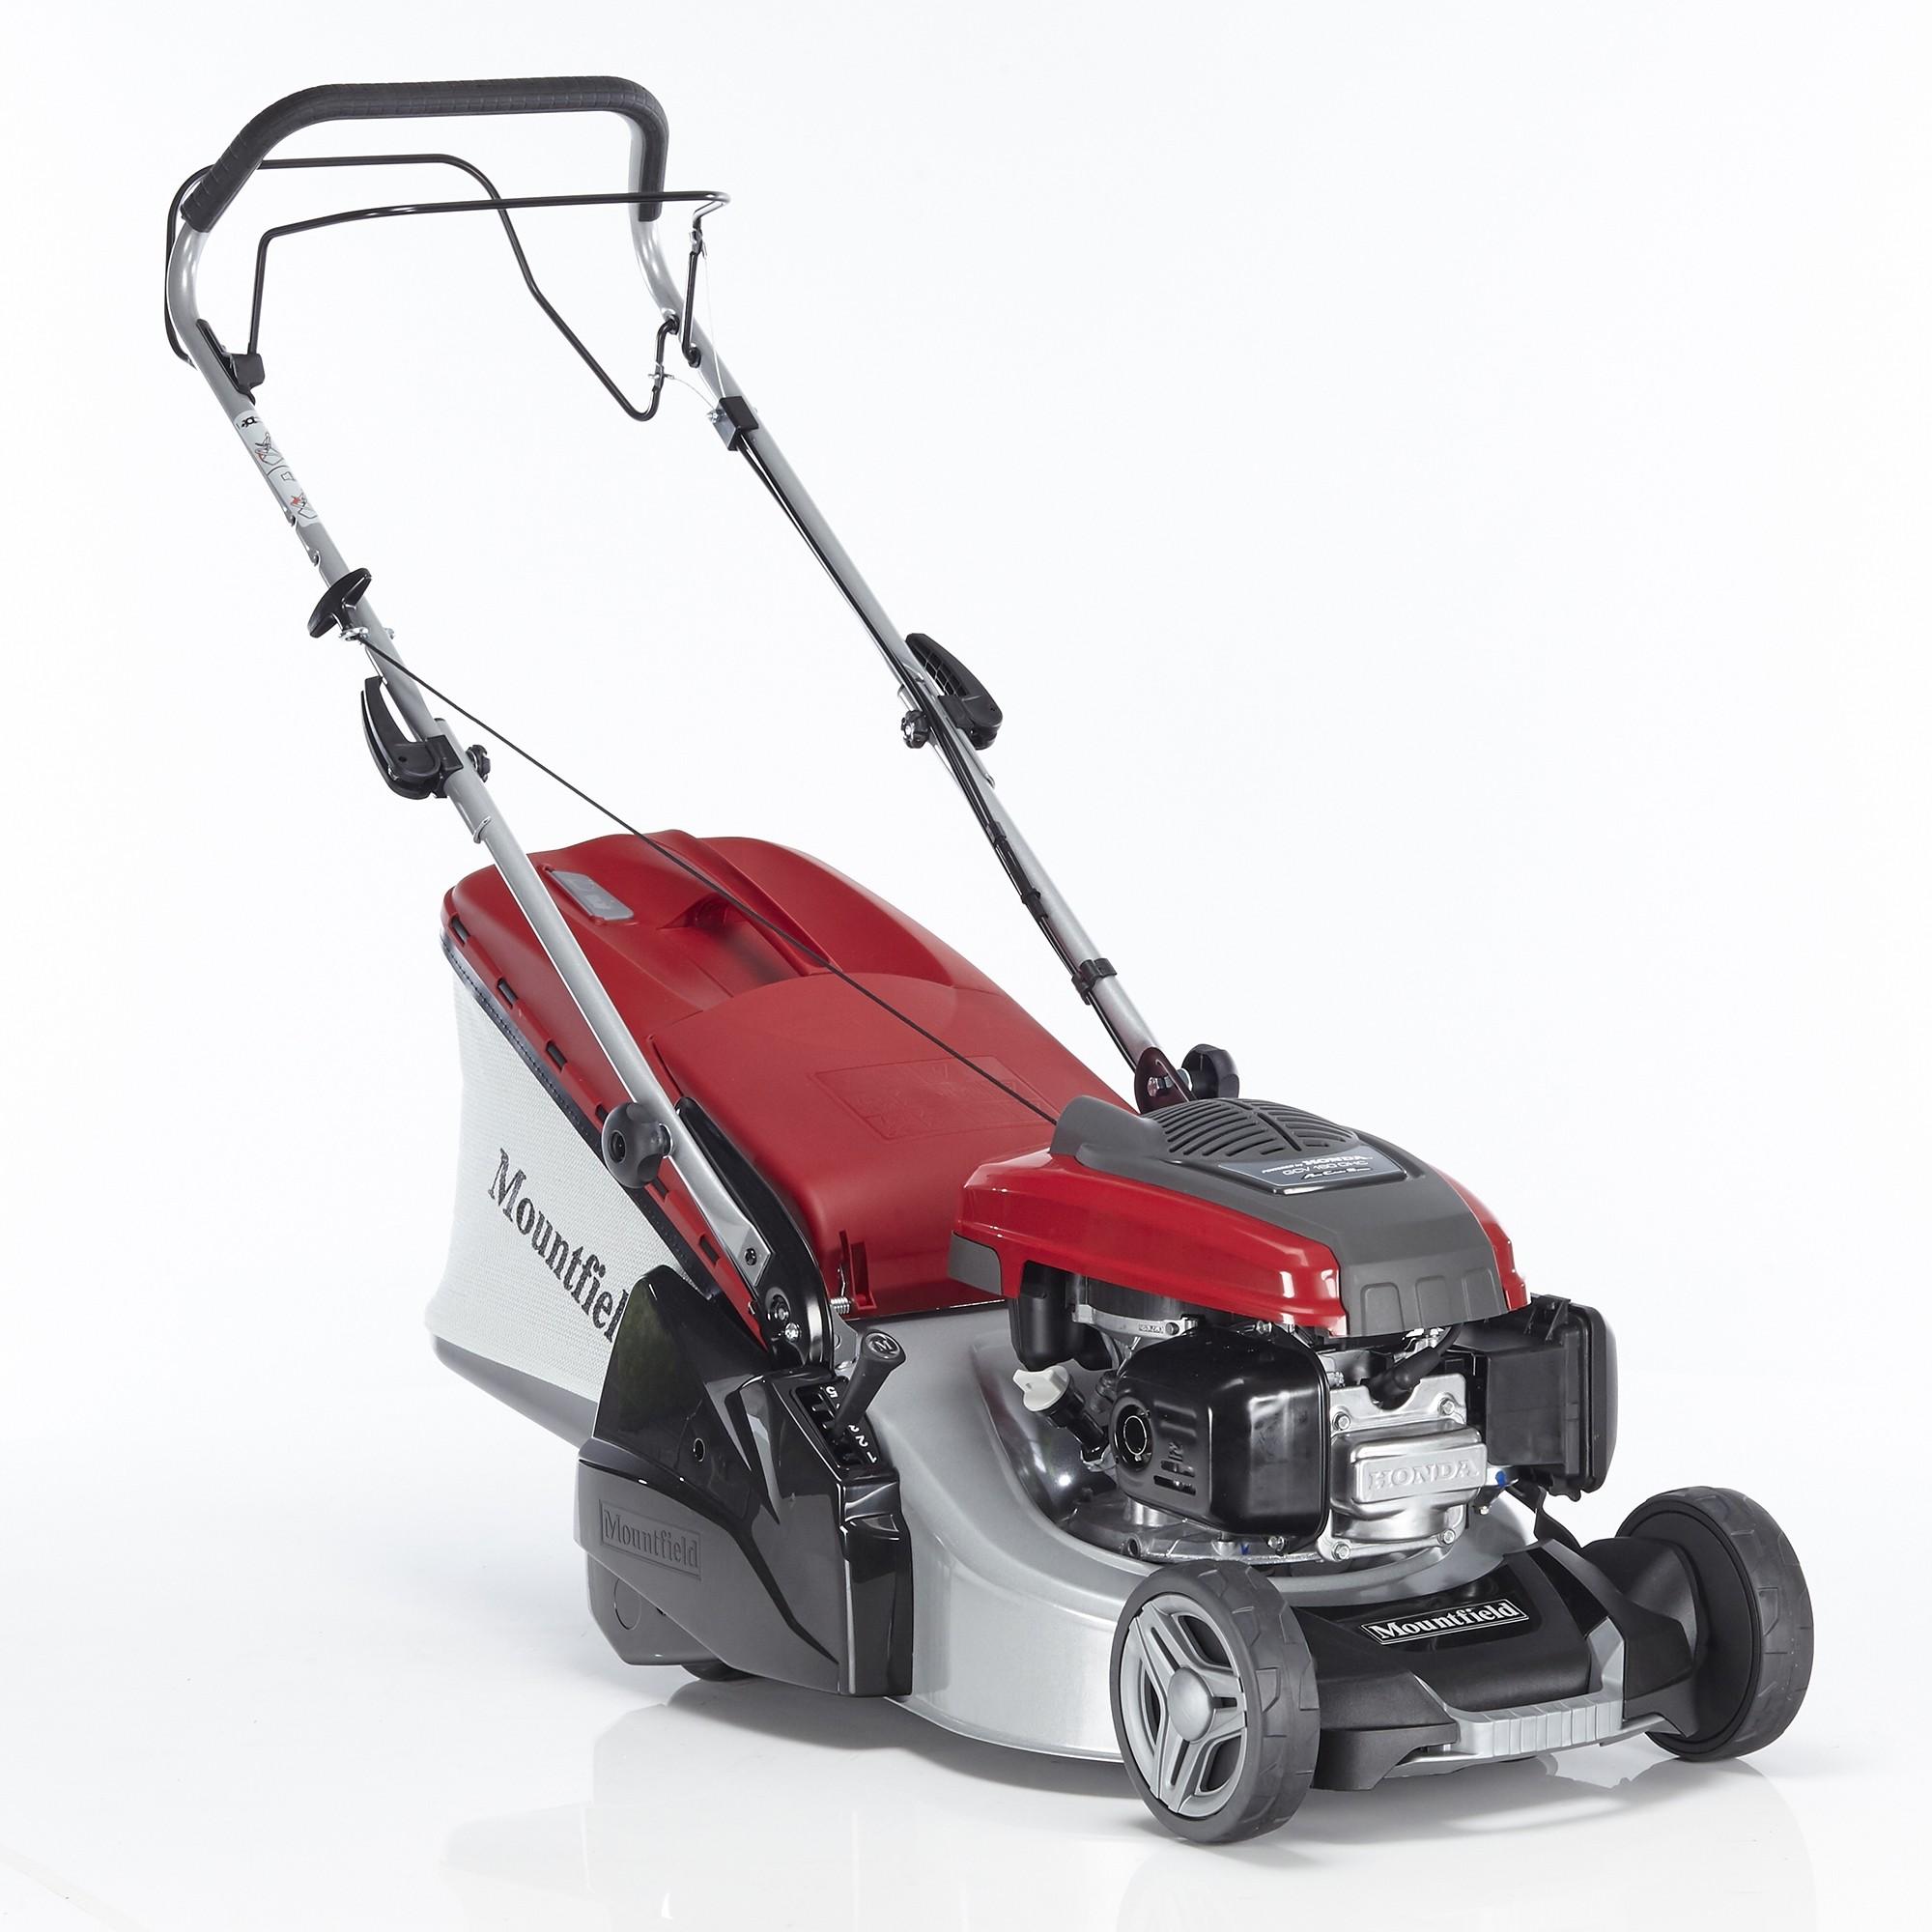 SP425r lawnmower